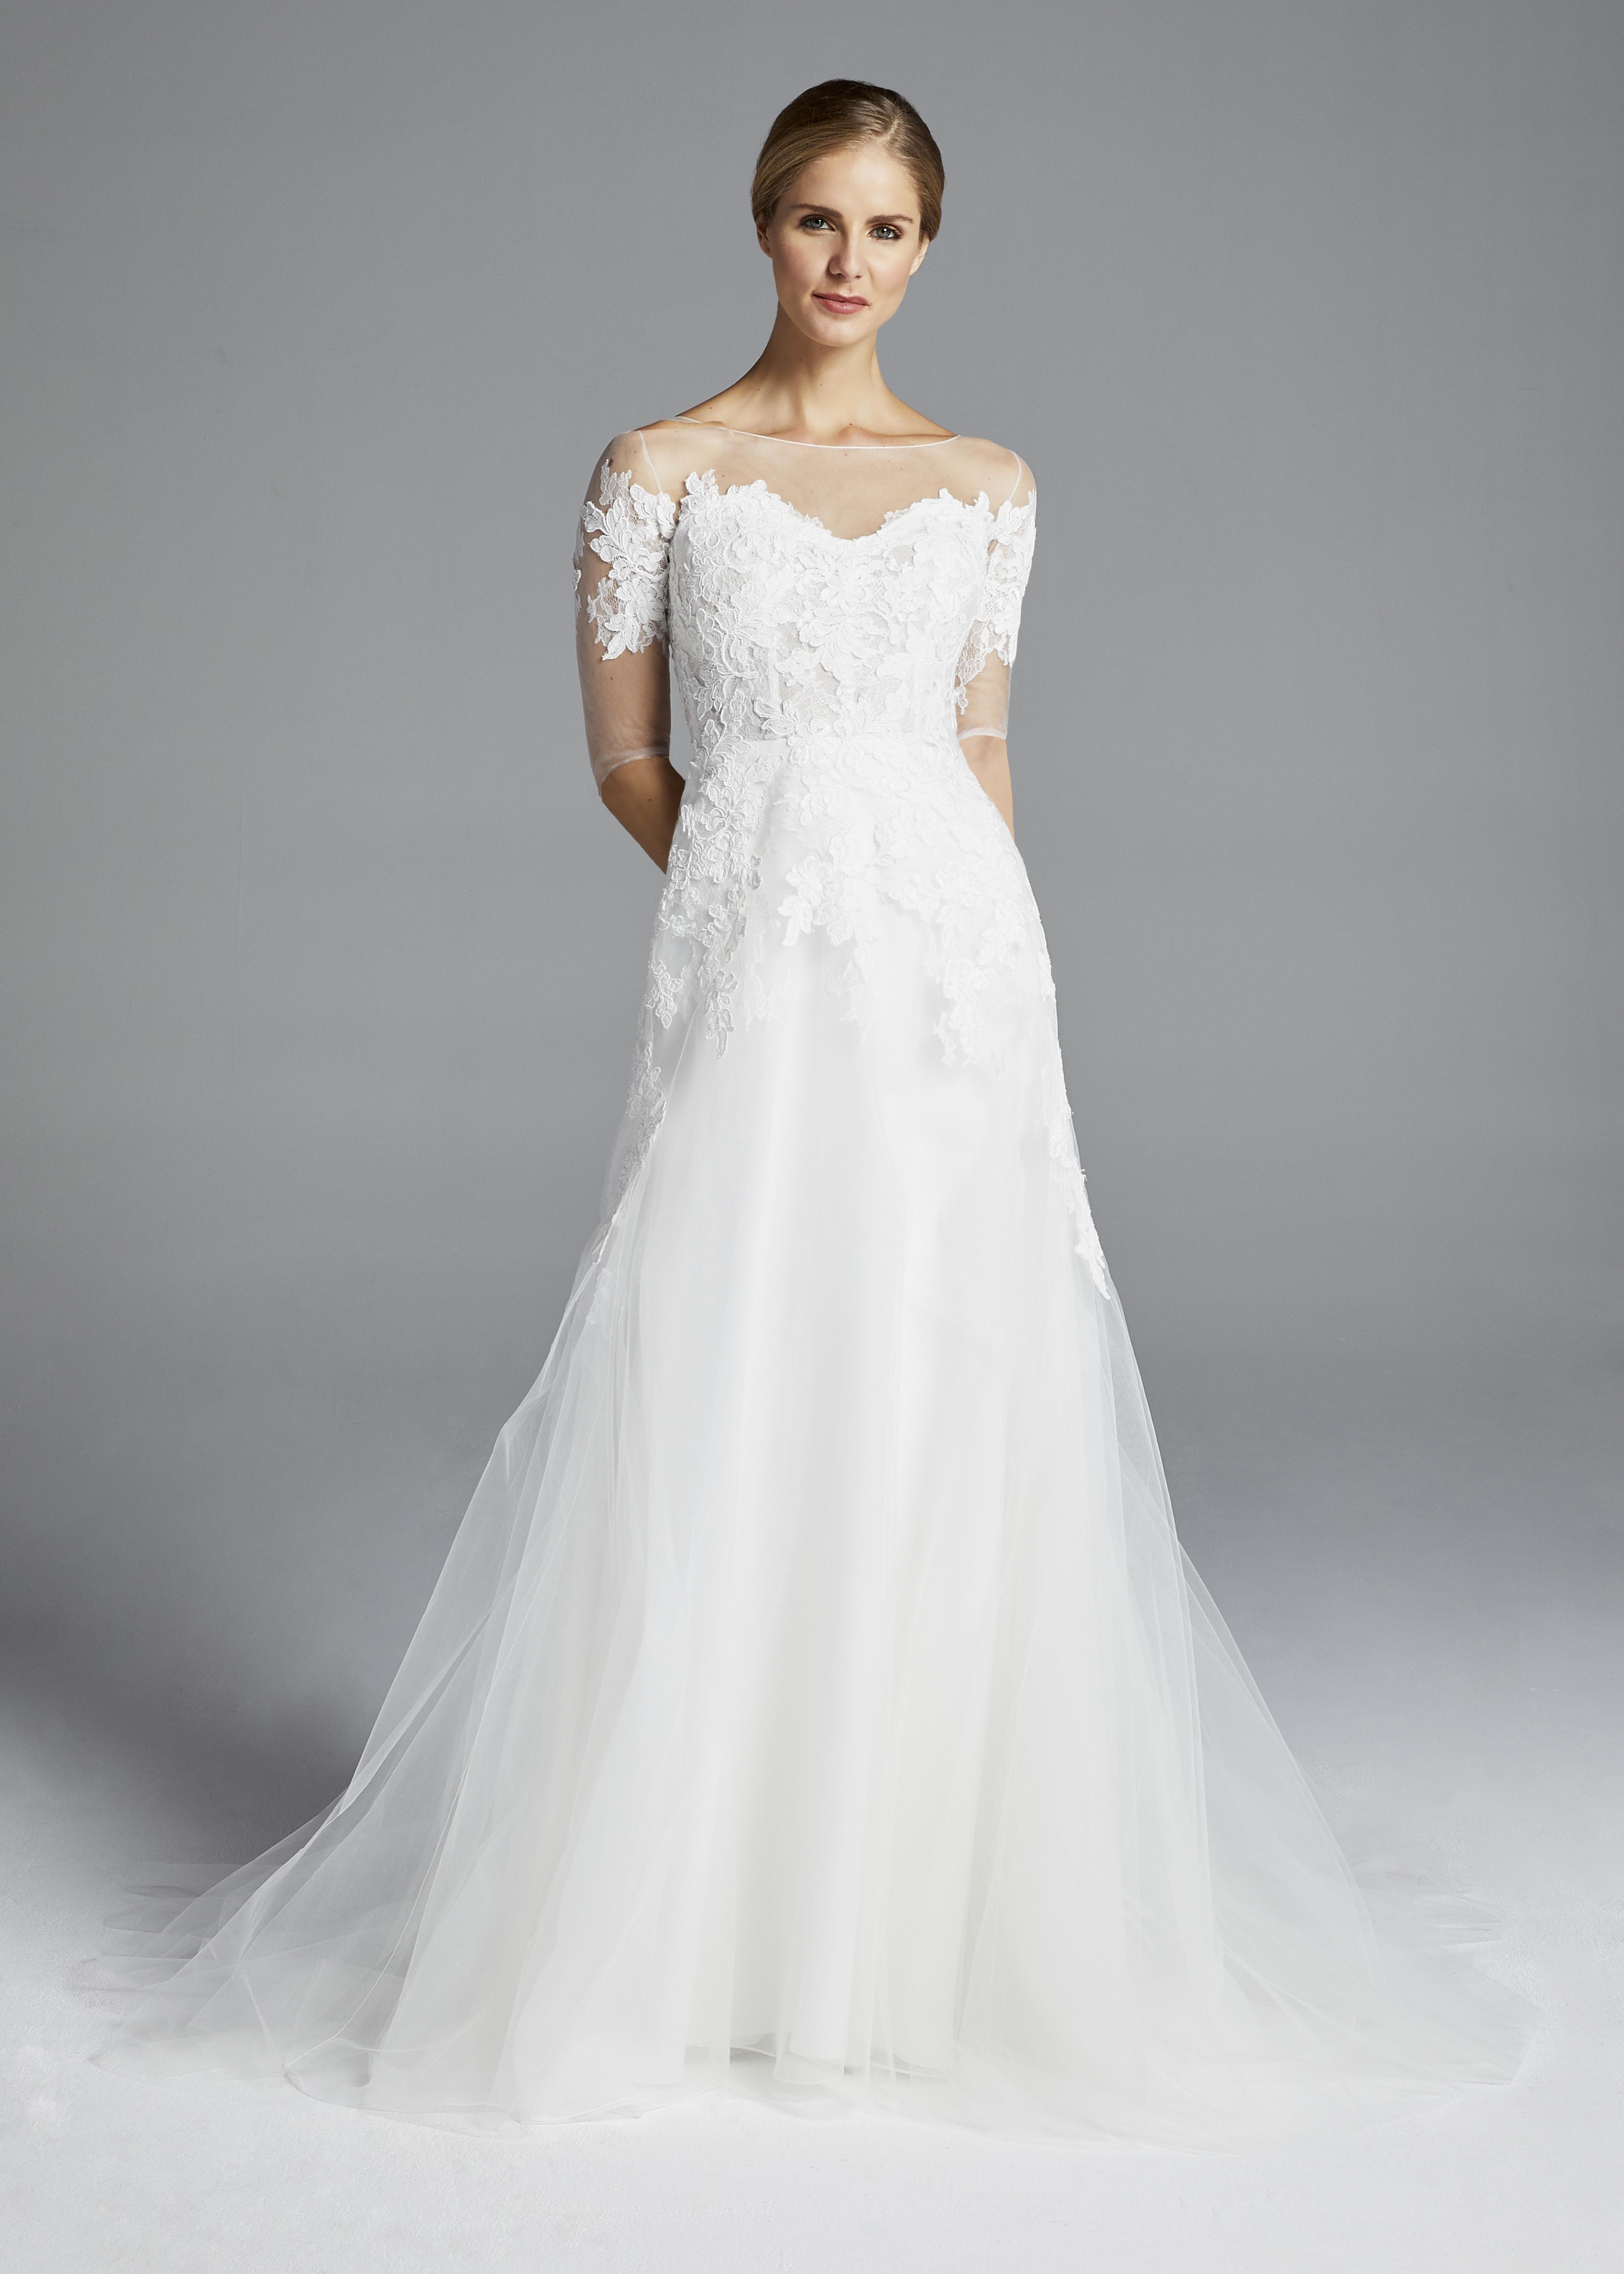 anne barge illusion sweetheart wedding dress spring 2019